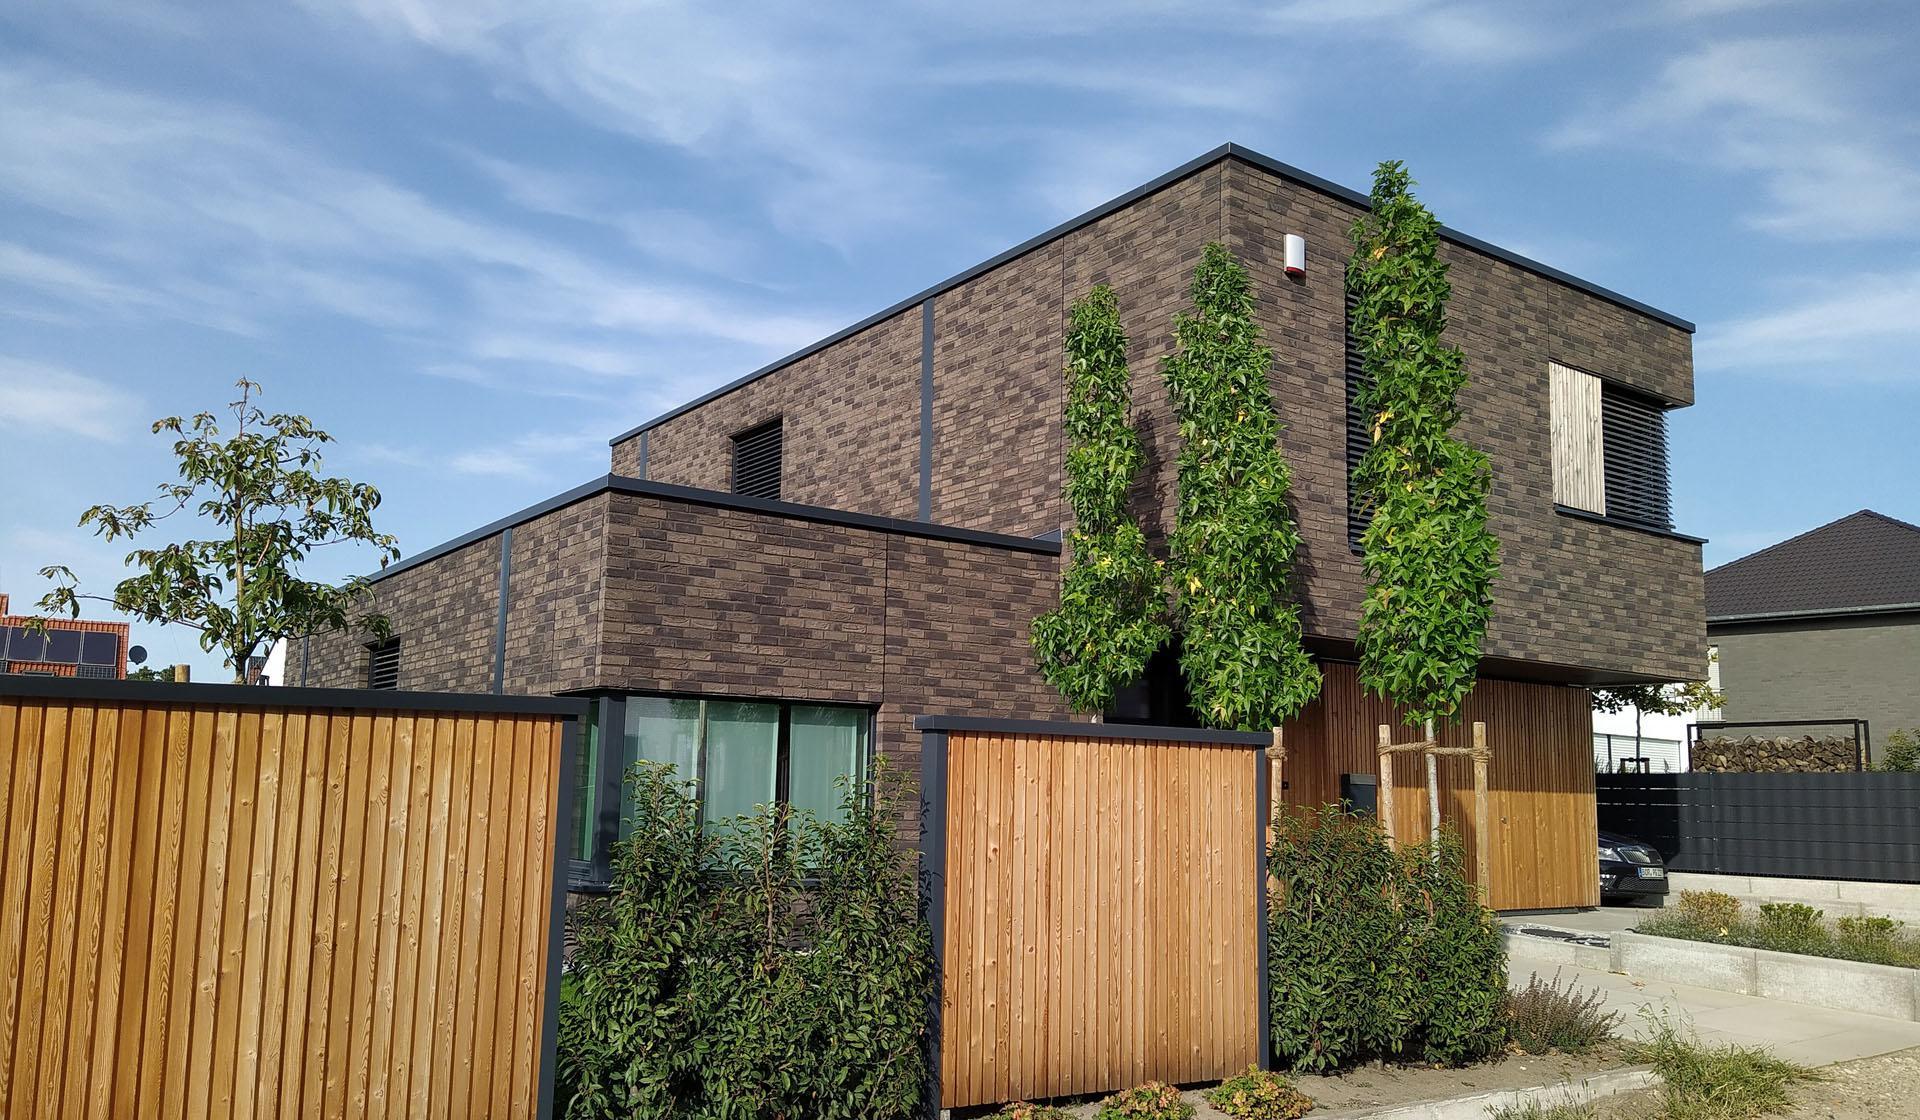 Woning Rhede - Het Fundament Architectuur